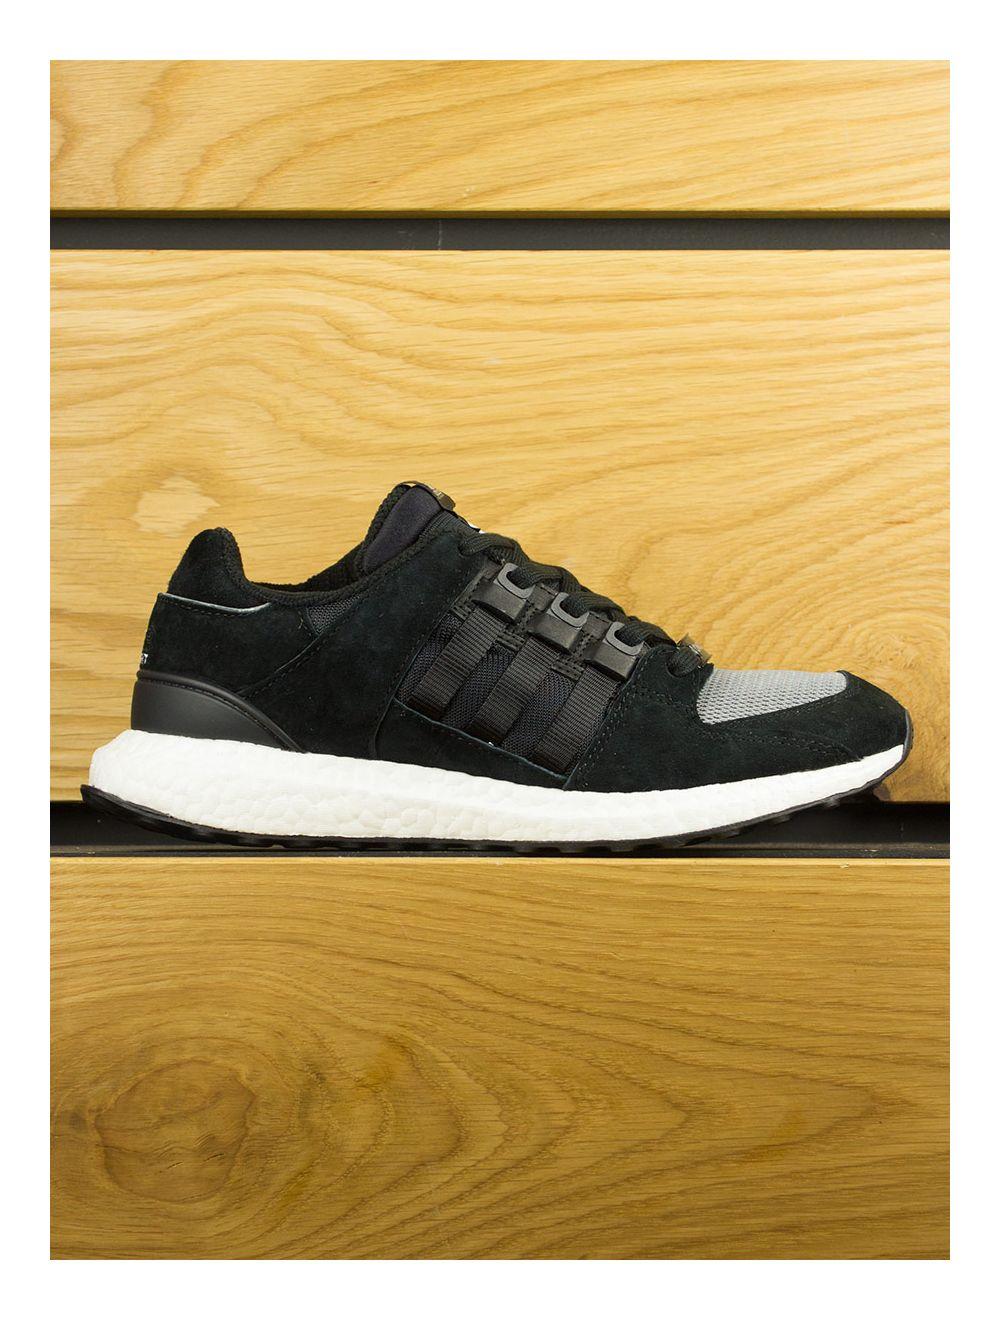 sale retailer f6fd5 328a5 Adidas Consortium x Concepts EQT Support 93/16 Ultra Boost - White Black